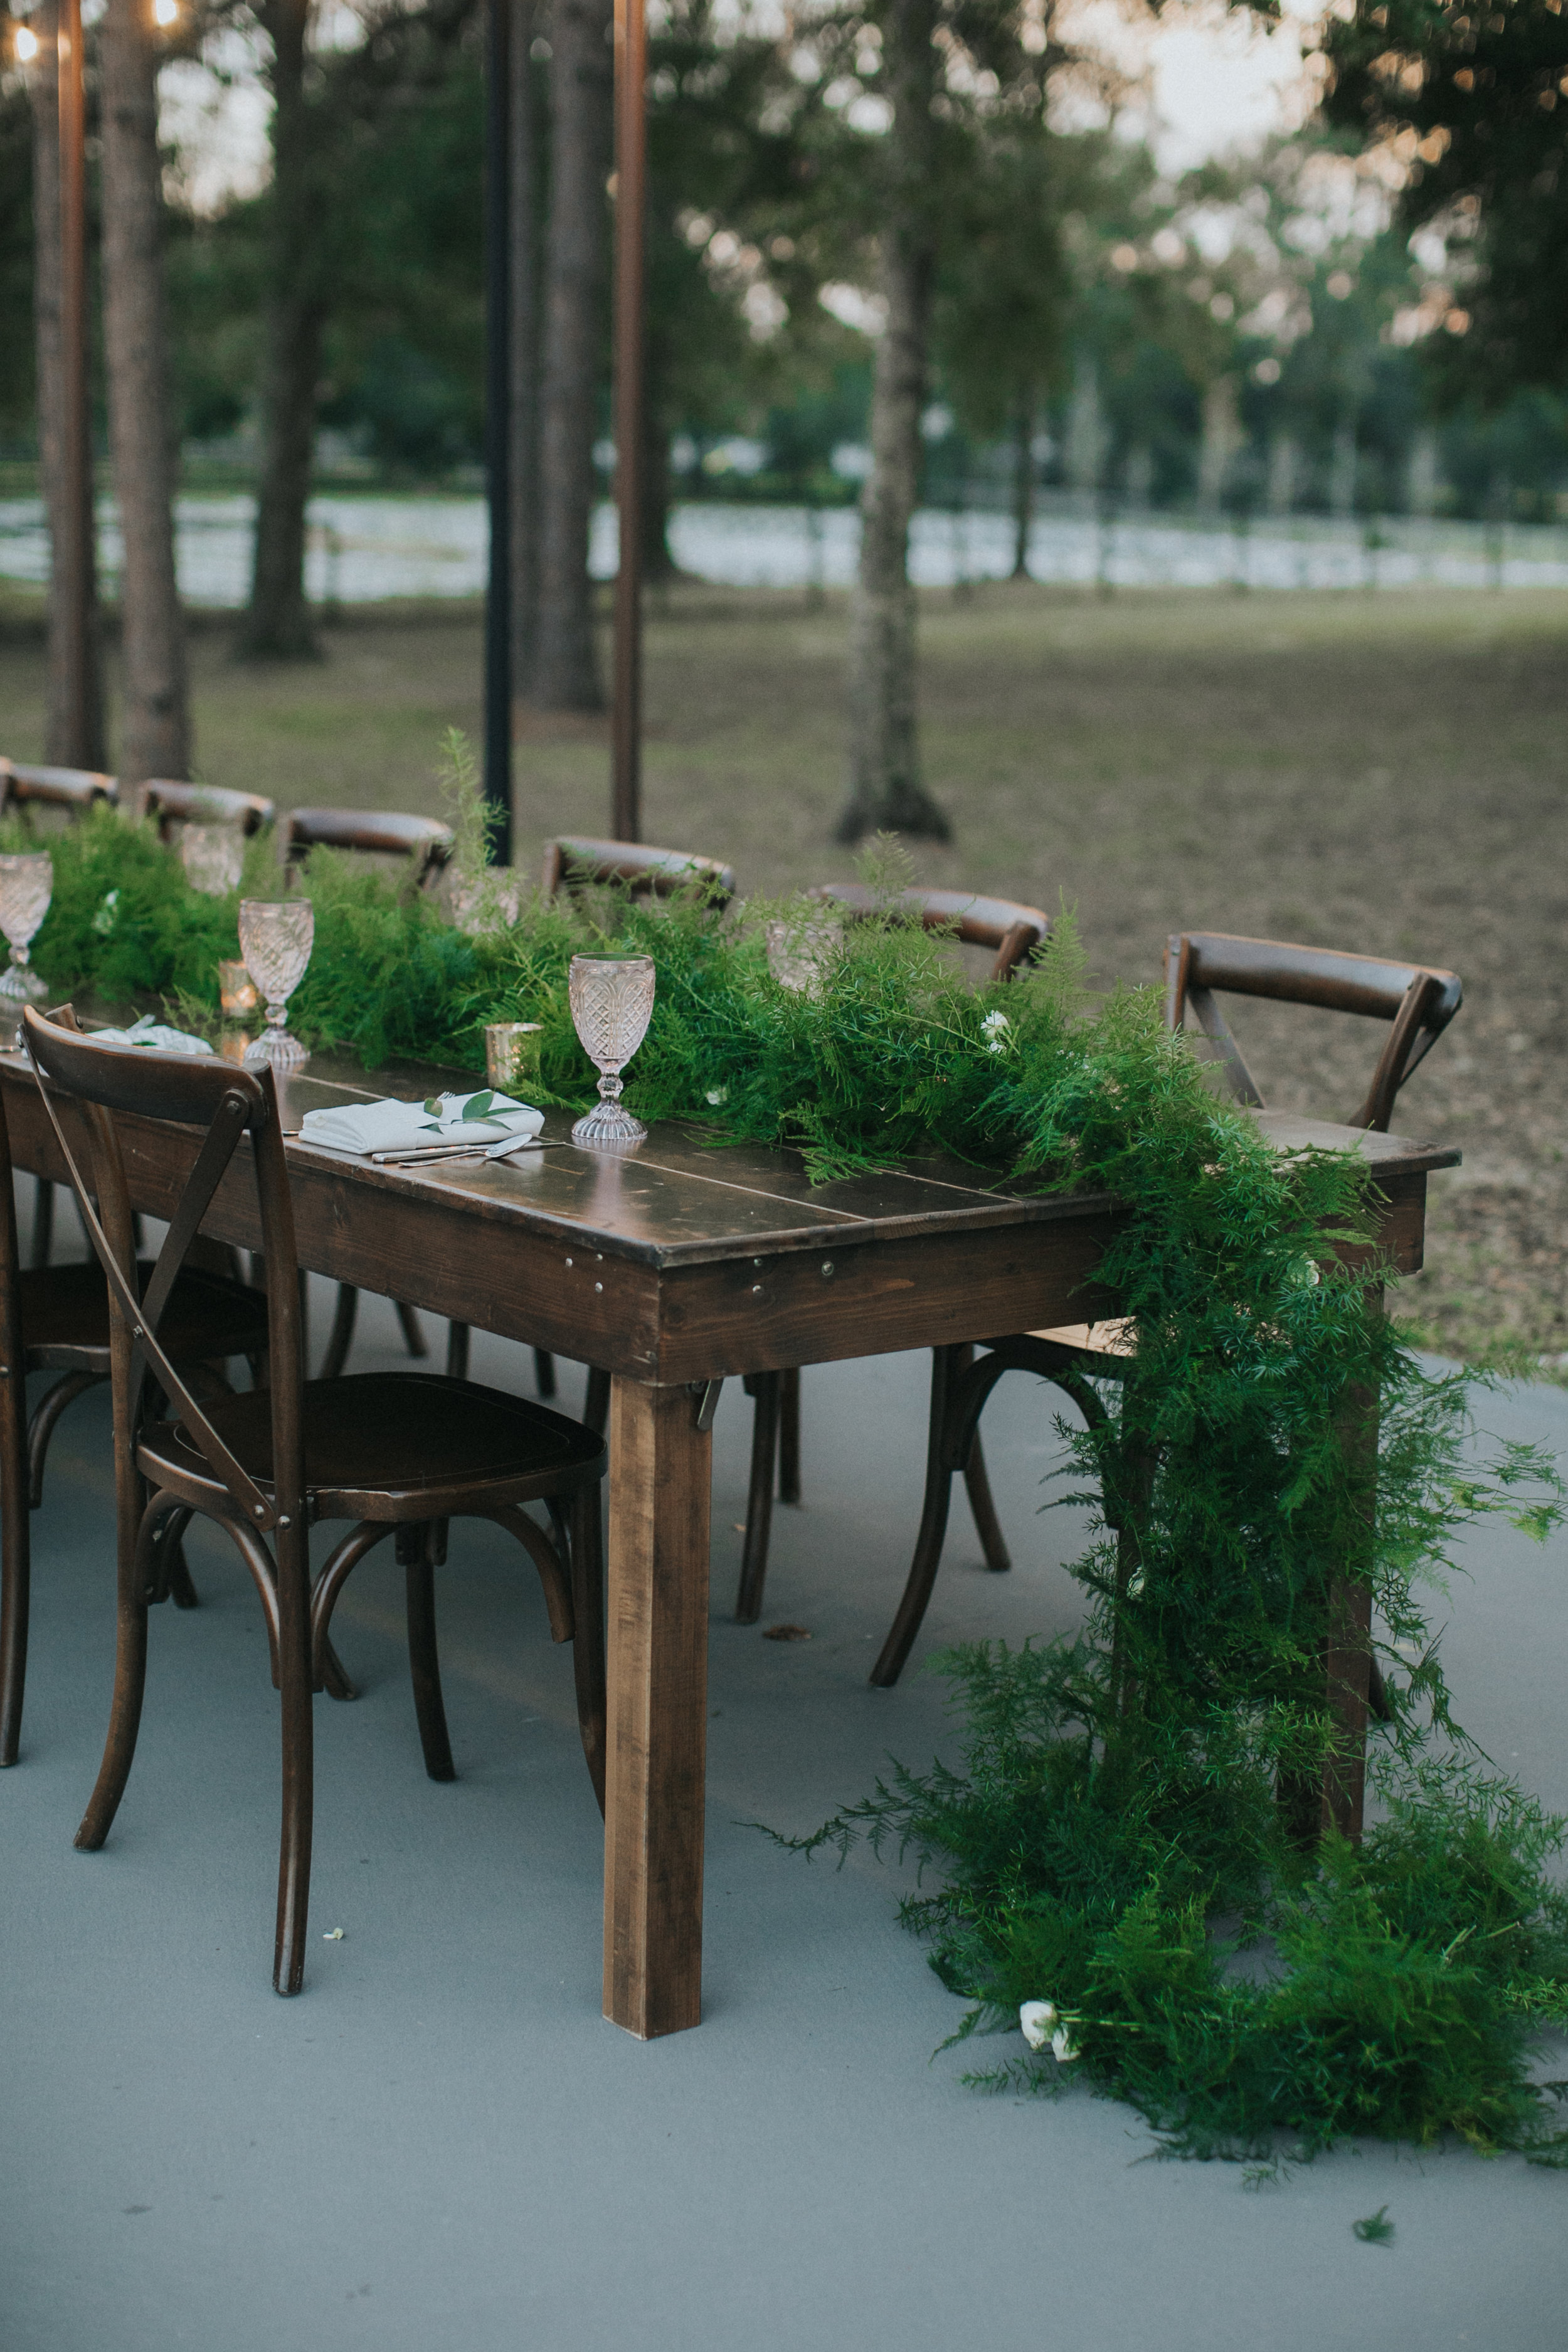 Bluegrass Chic - Farm Tables Garland